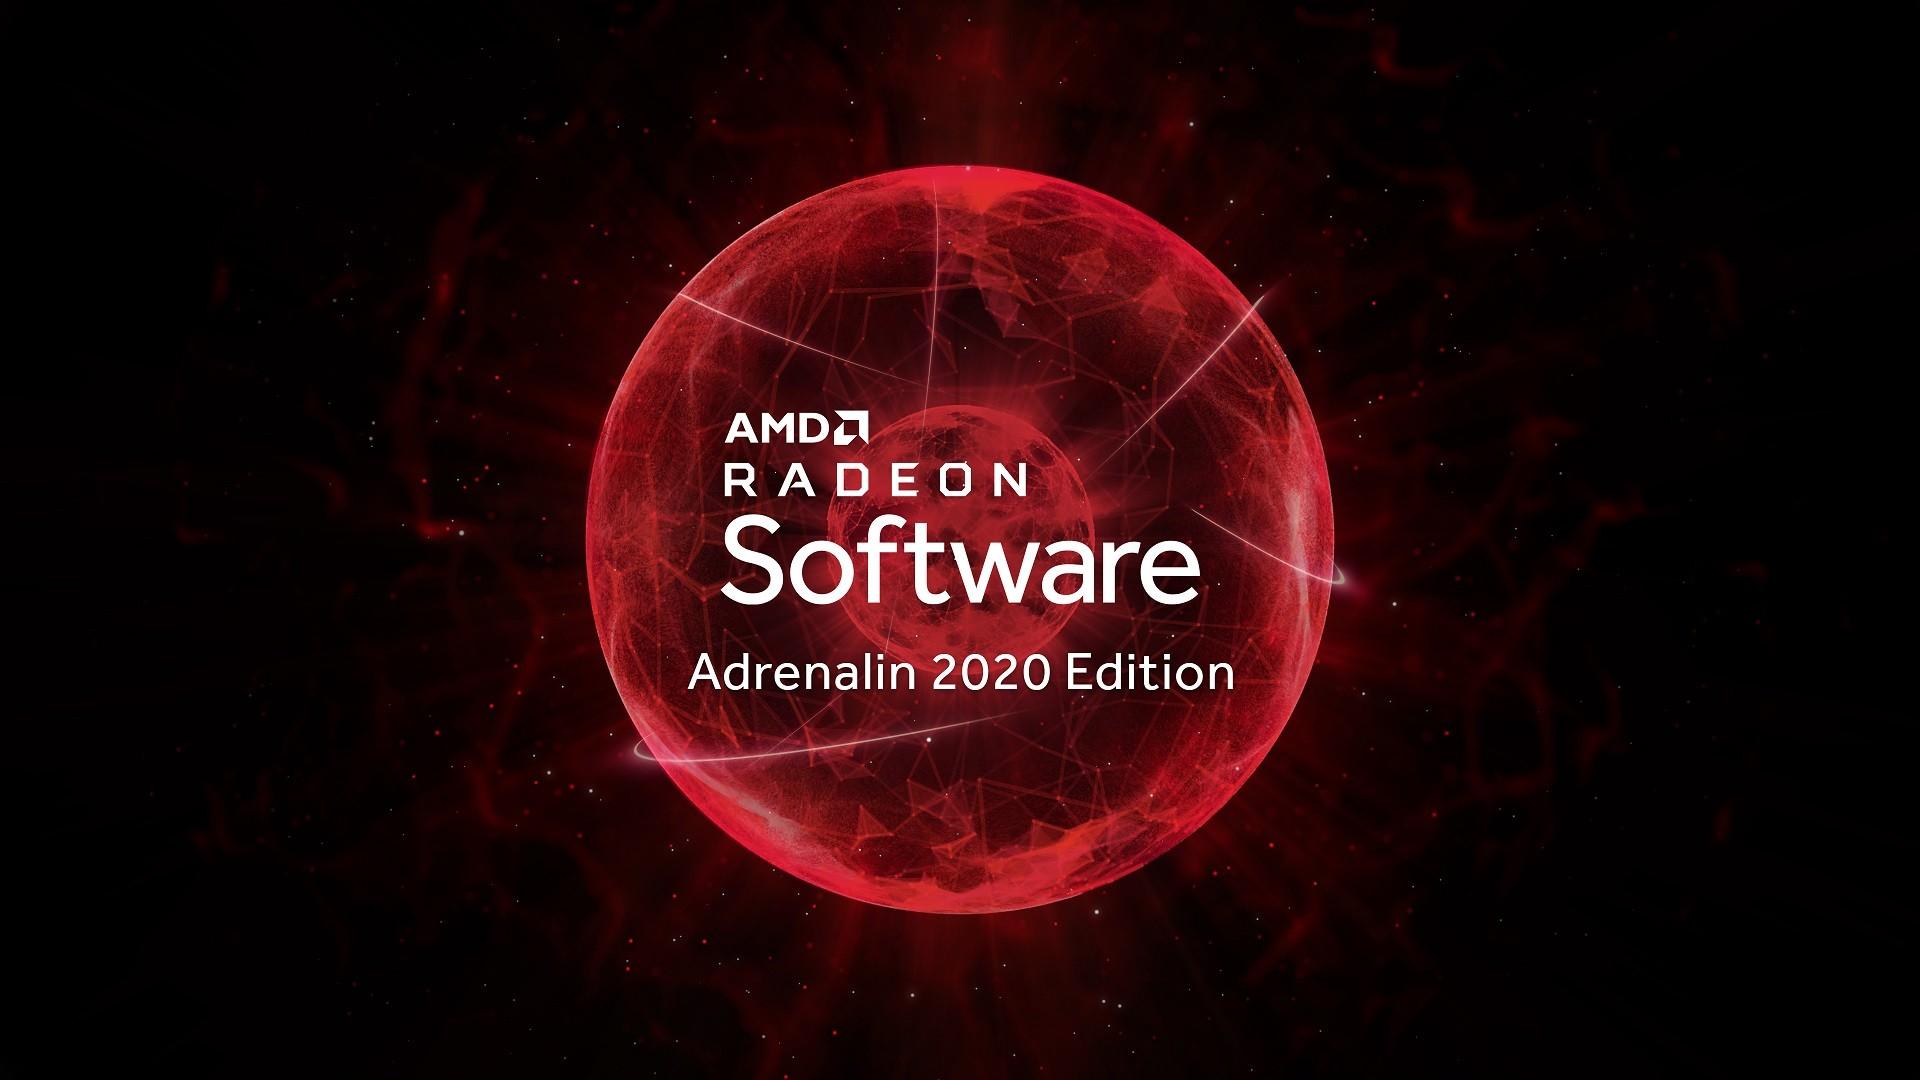 AMD Radeon Software